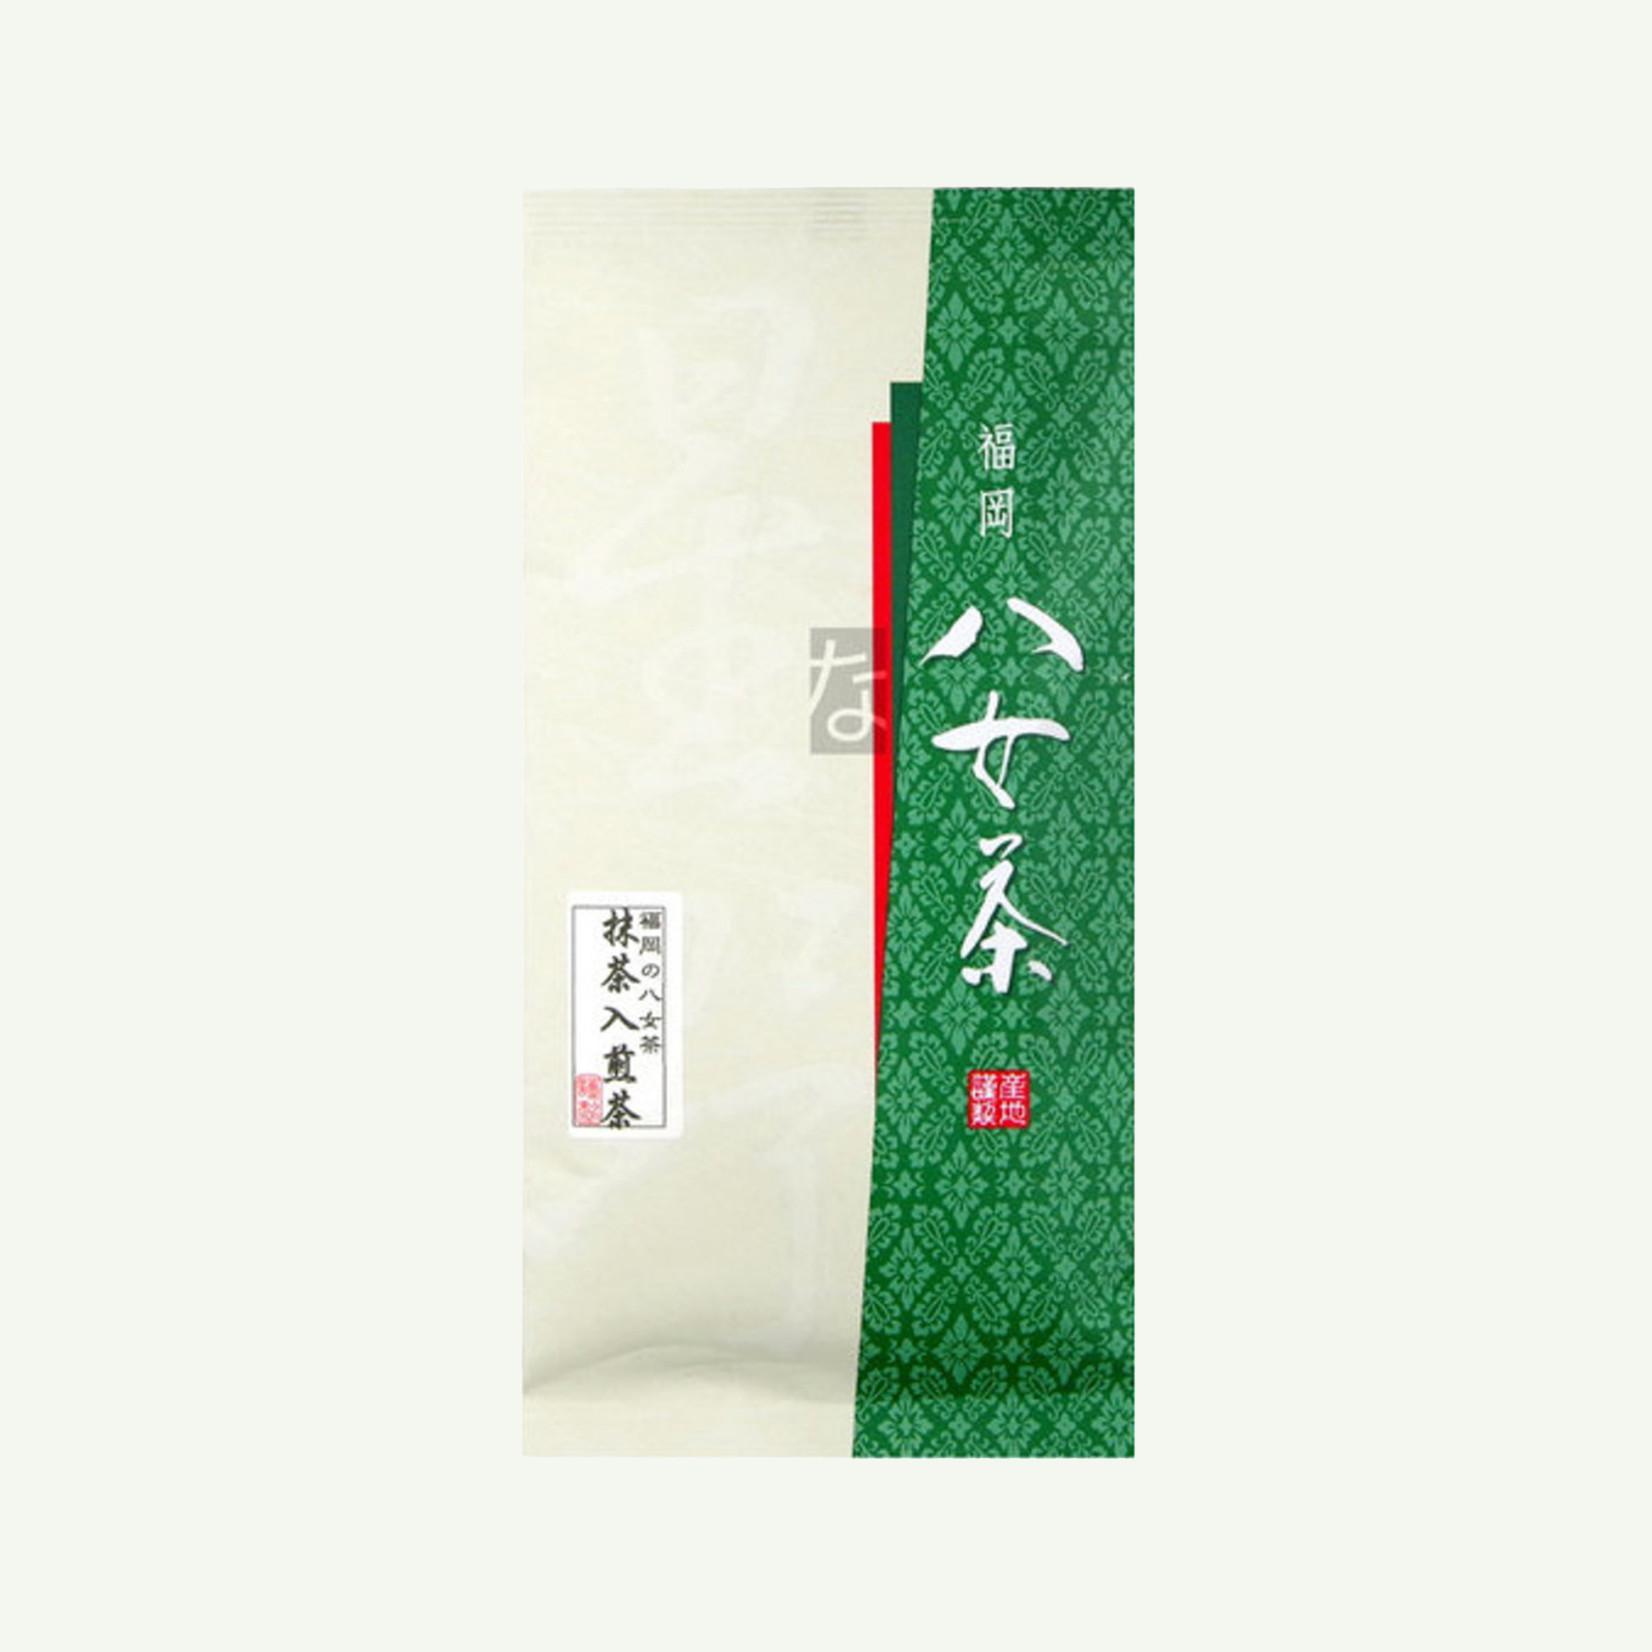 Koffiebranderij Sao Paulo Japan Sencha Matcha 100g - Losse thee